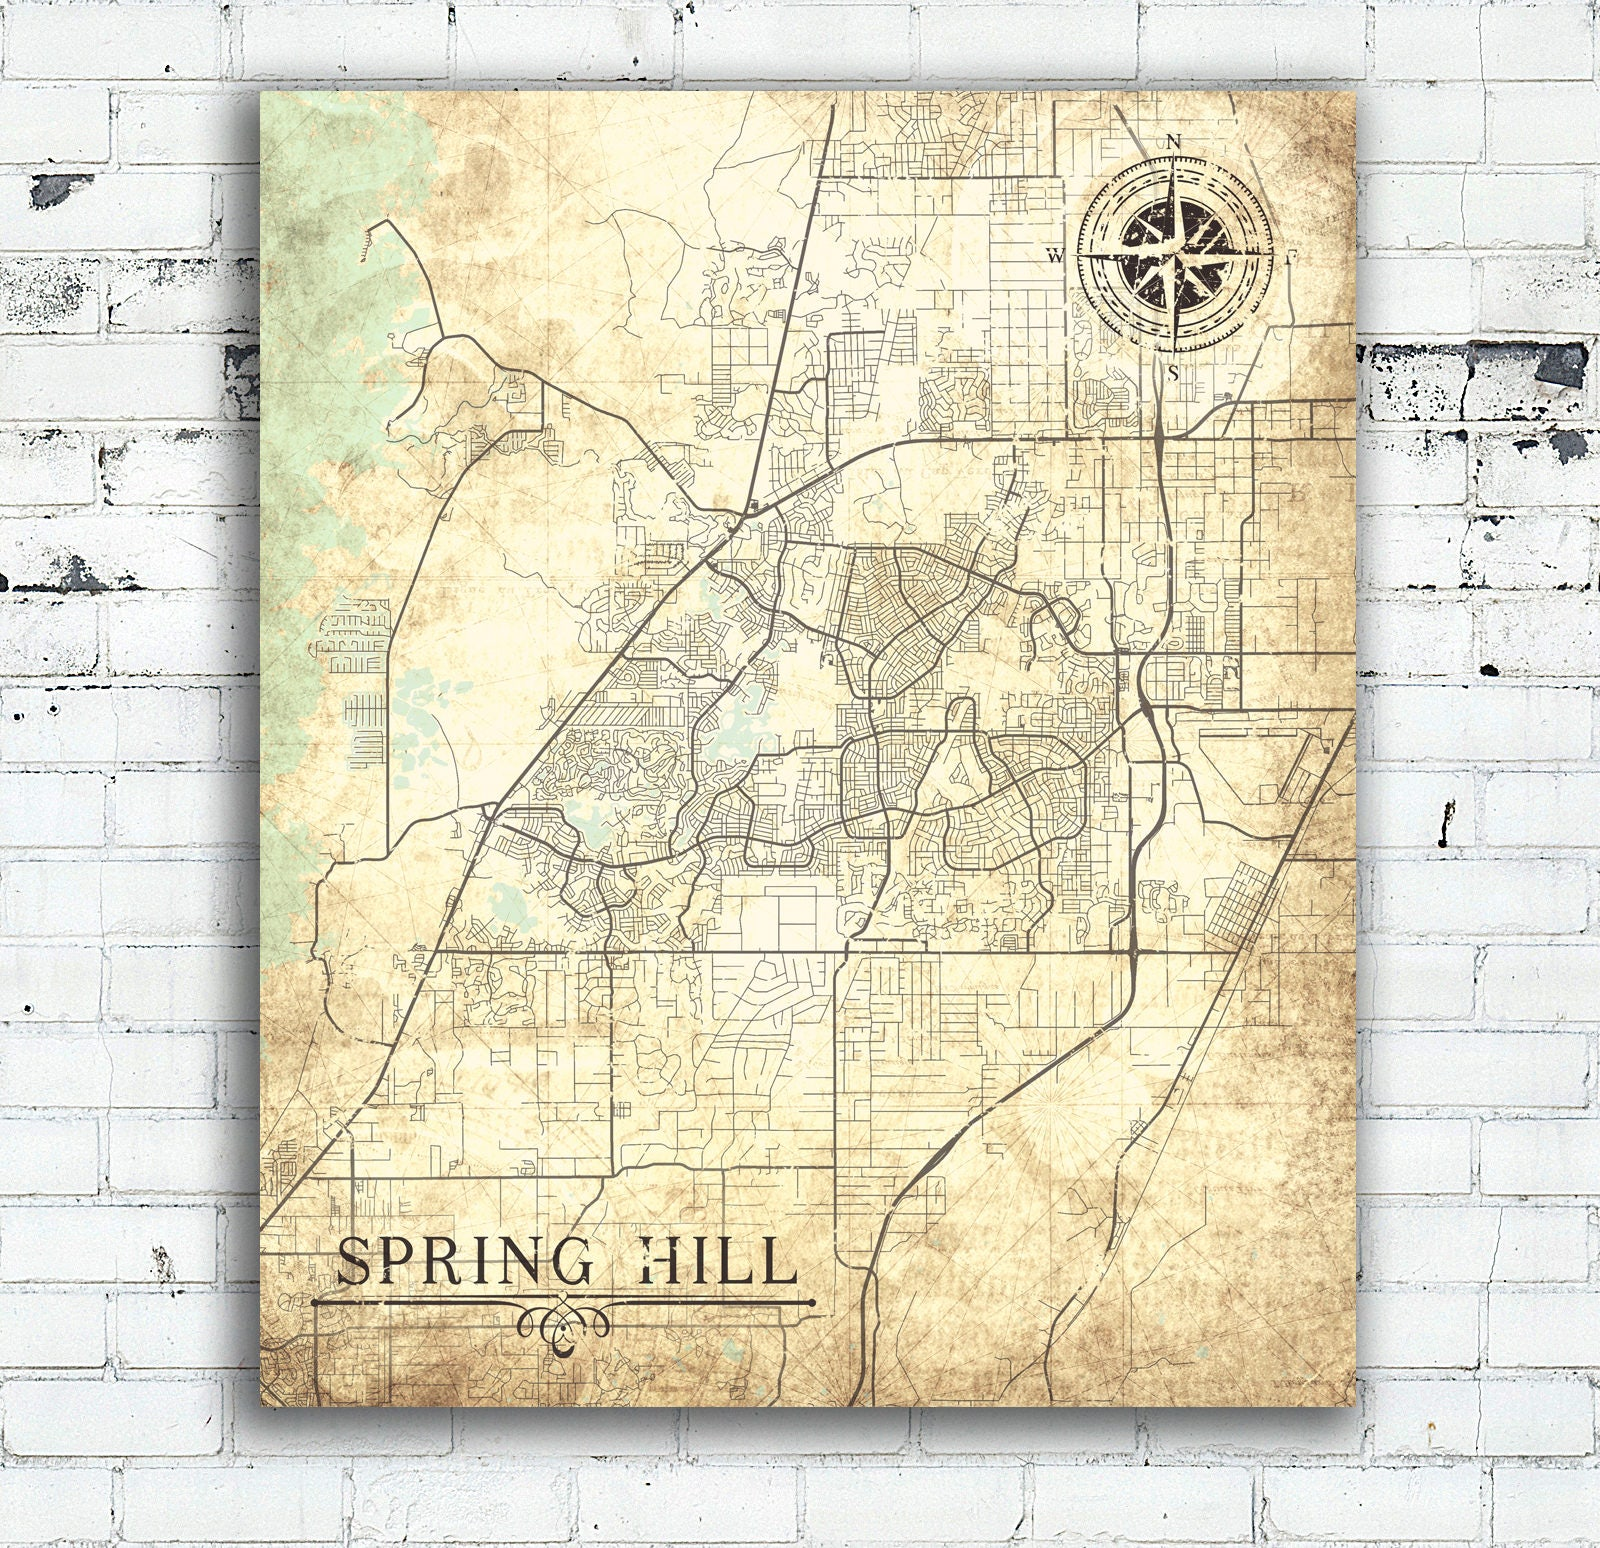 Map Of Spring Hill Florida.Spring Hill Fl Canvas Print Florida Fl Vintage Map Spring Hill City